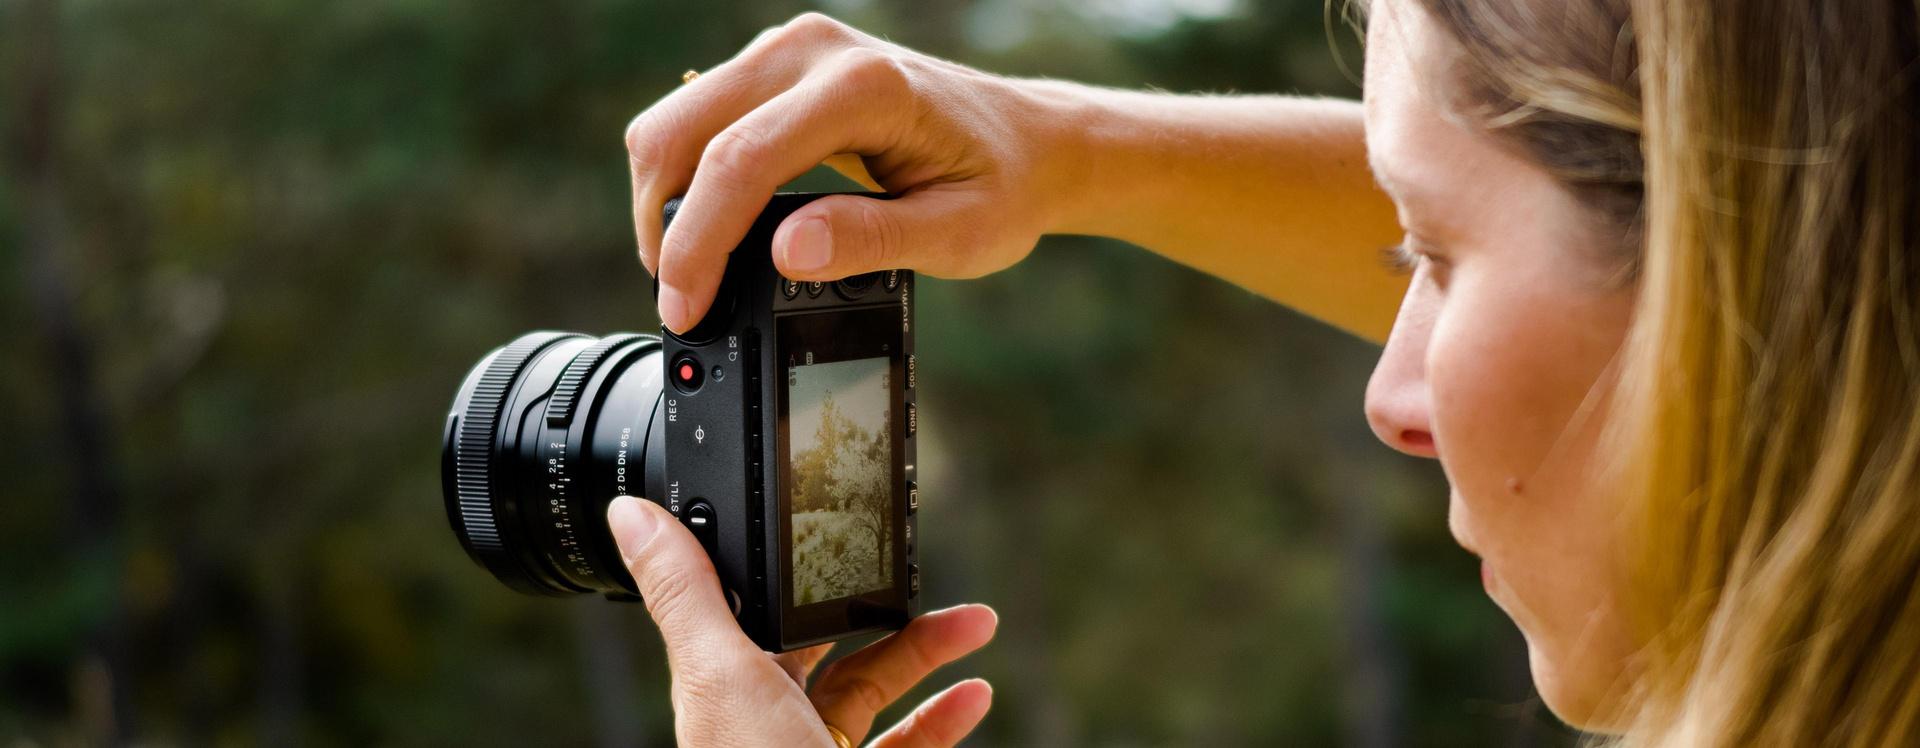 Kamera-Rabattaktion